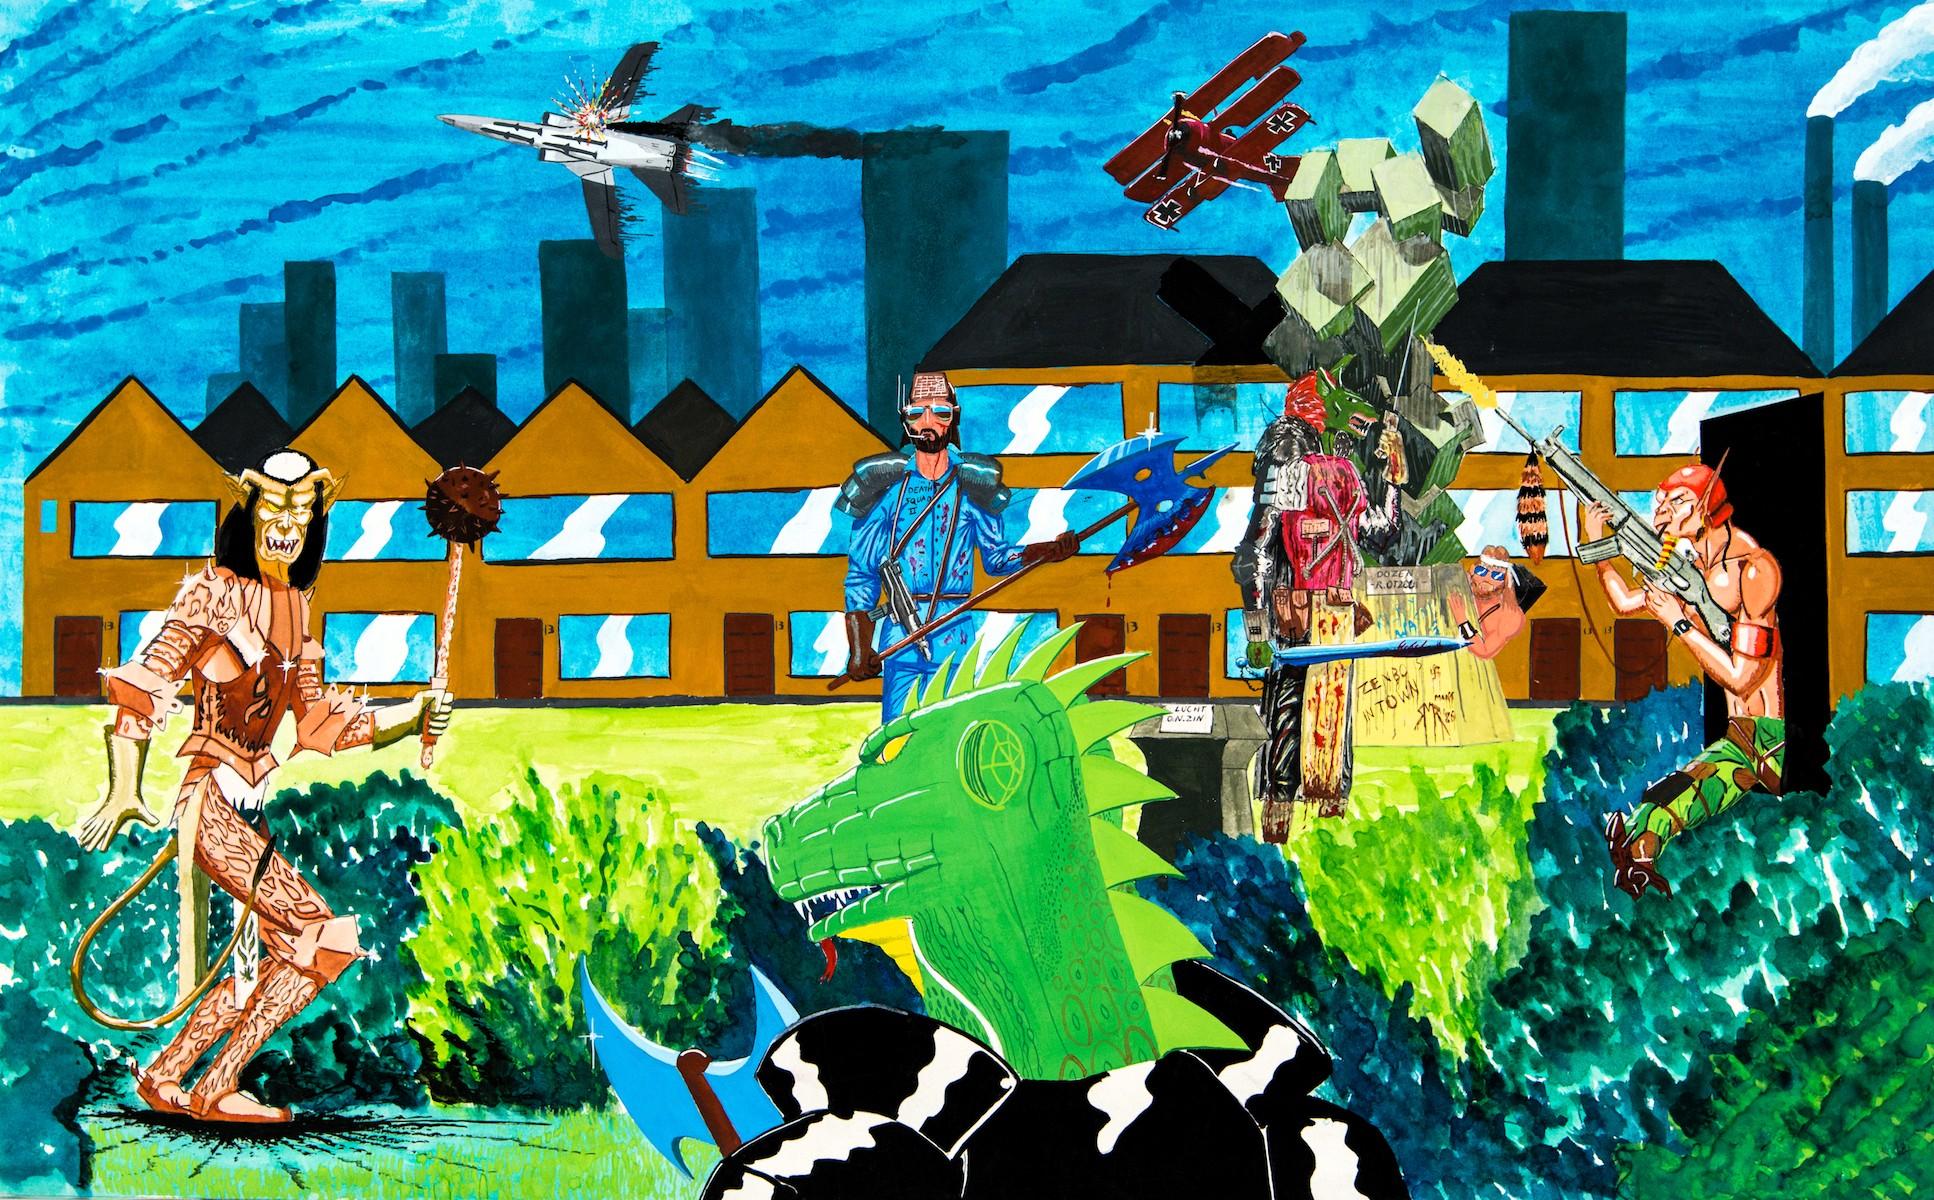 Eindwerkstuk 'De verlaten stad'